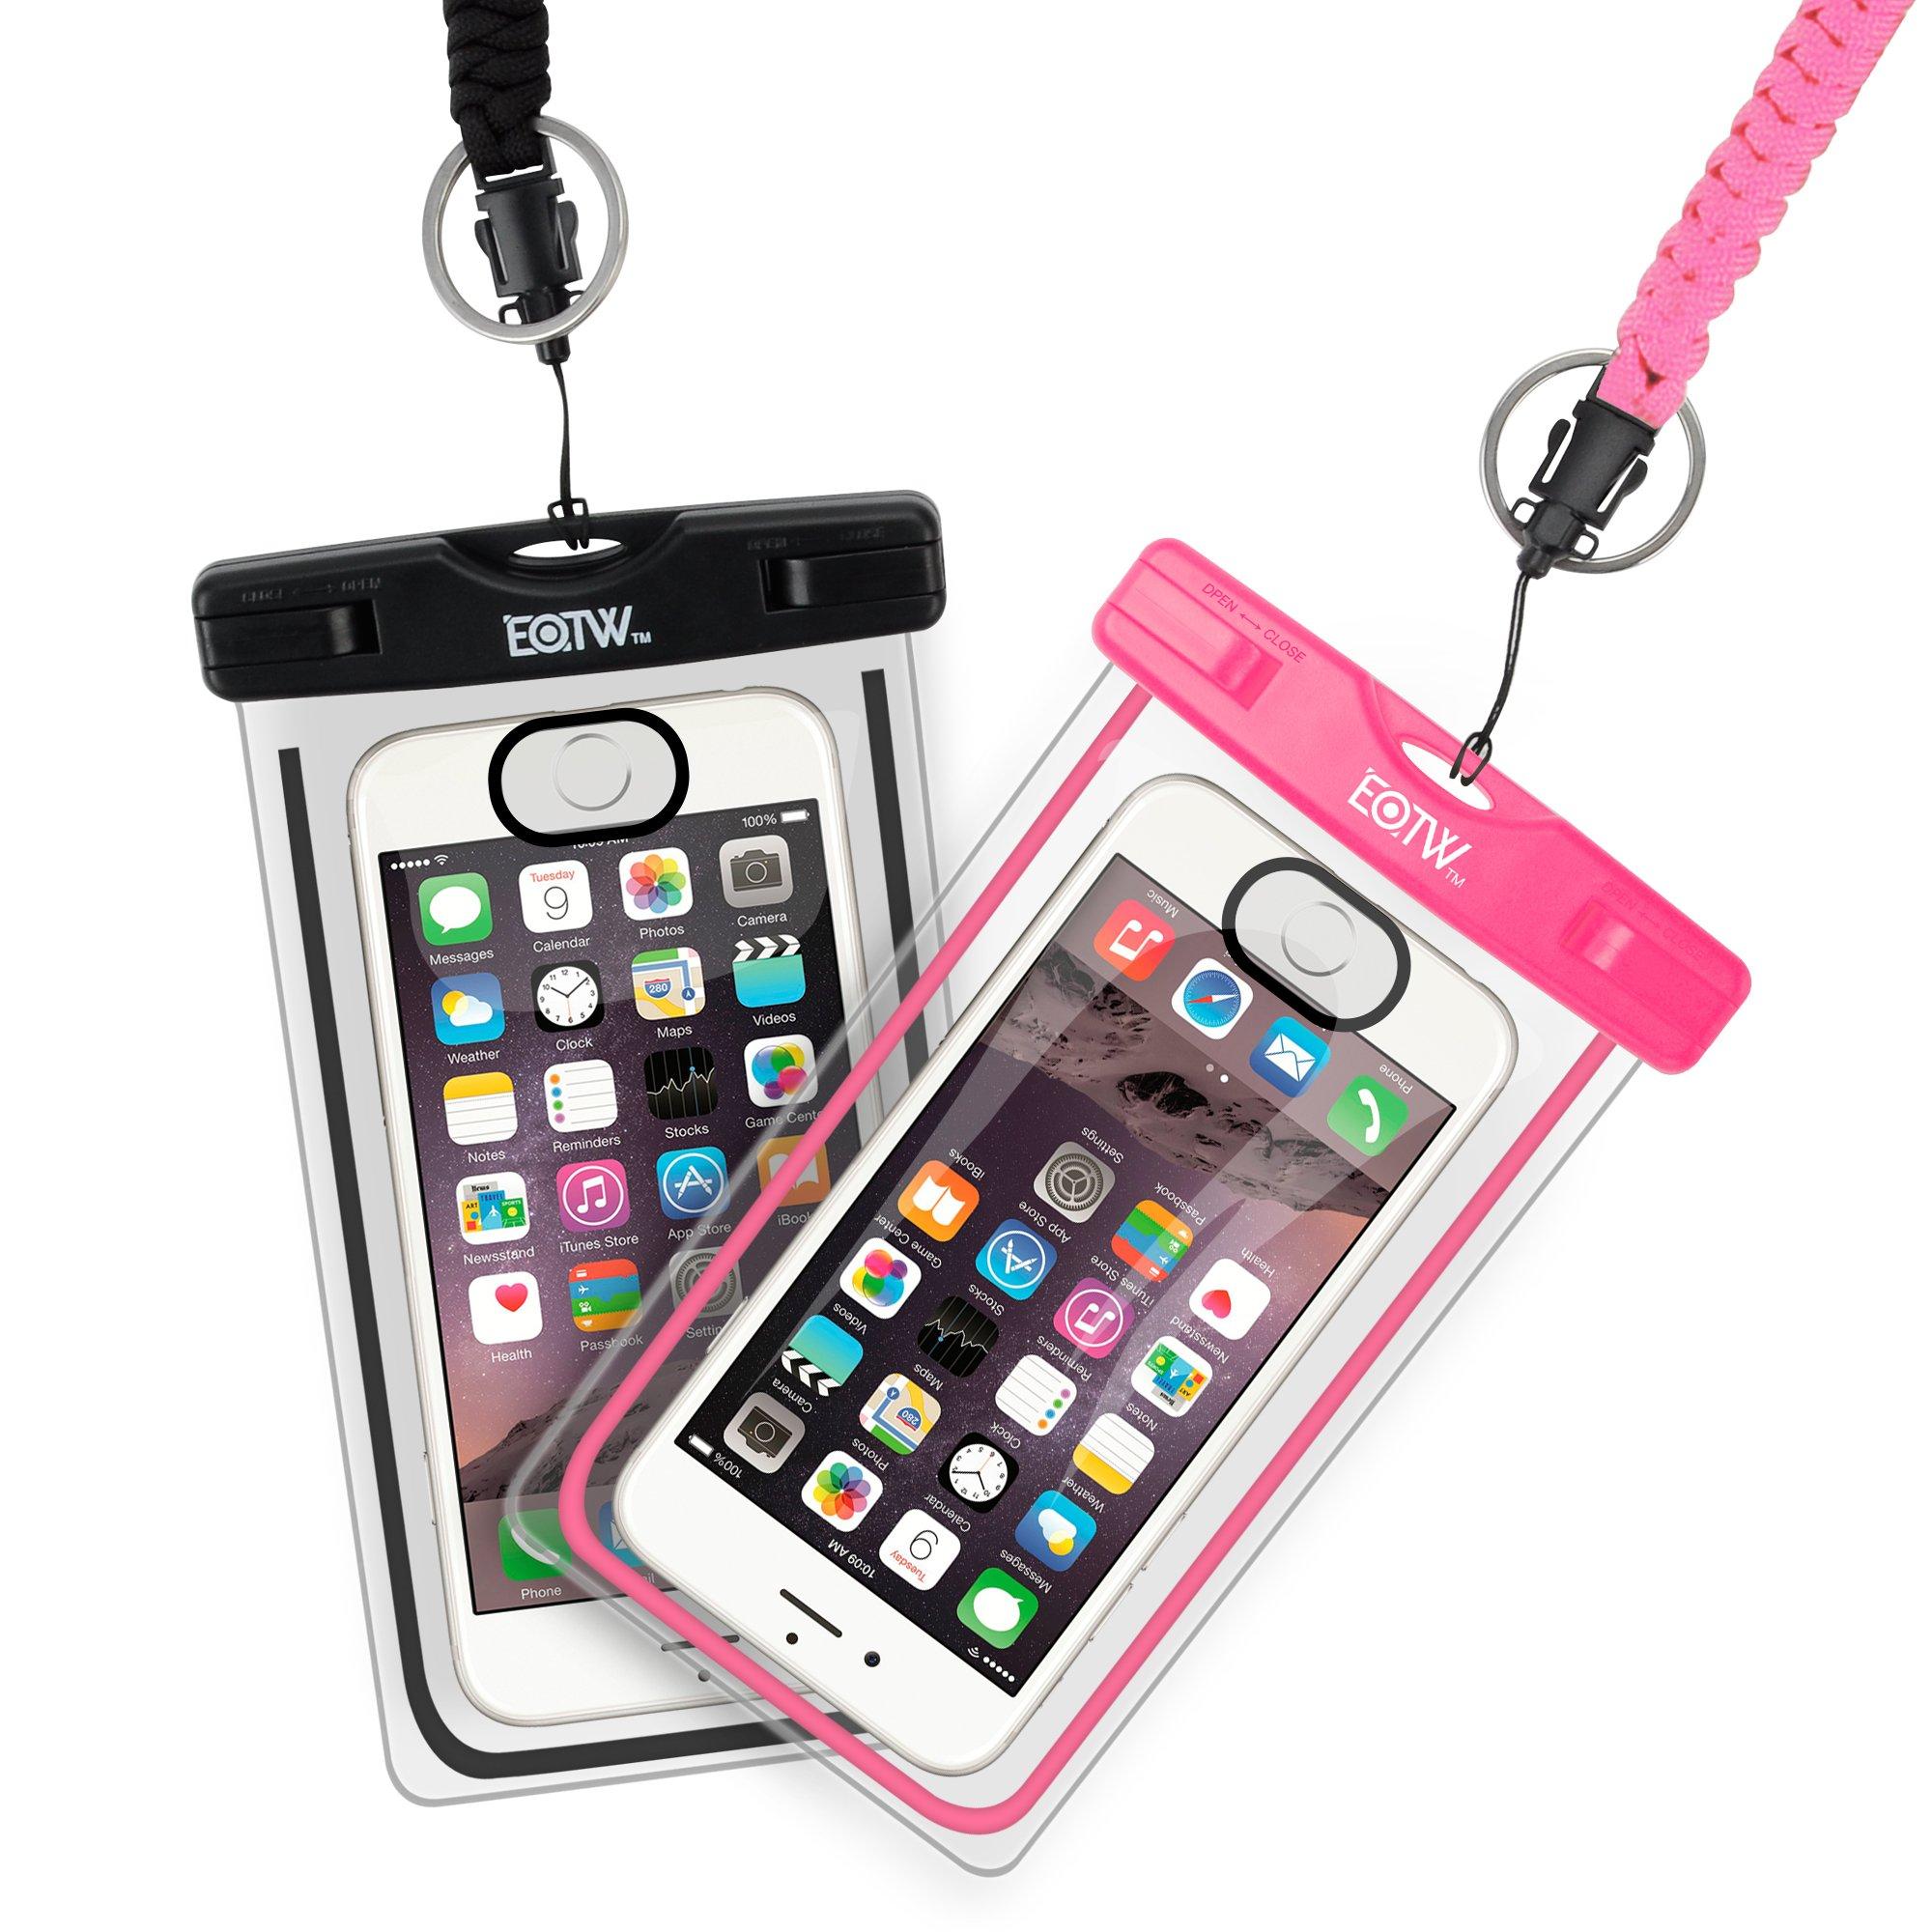 EOTW Waterproof Phone Pouch, Touch-ID Fingerprint Unlock Waterproof Phone Case for iPhone Xs Max XS XR X 8 8plus 7 7plus 6 6S 5 5S SE 5C up to 6.5'' (2 Pack Touch ID Function) by EOTW